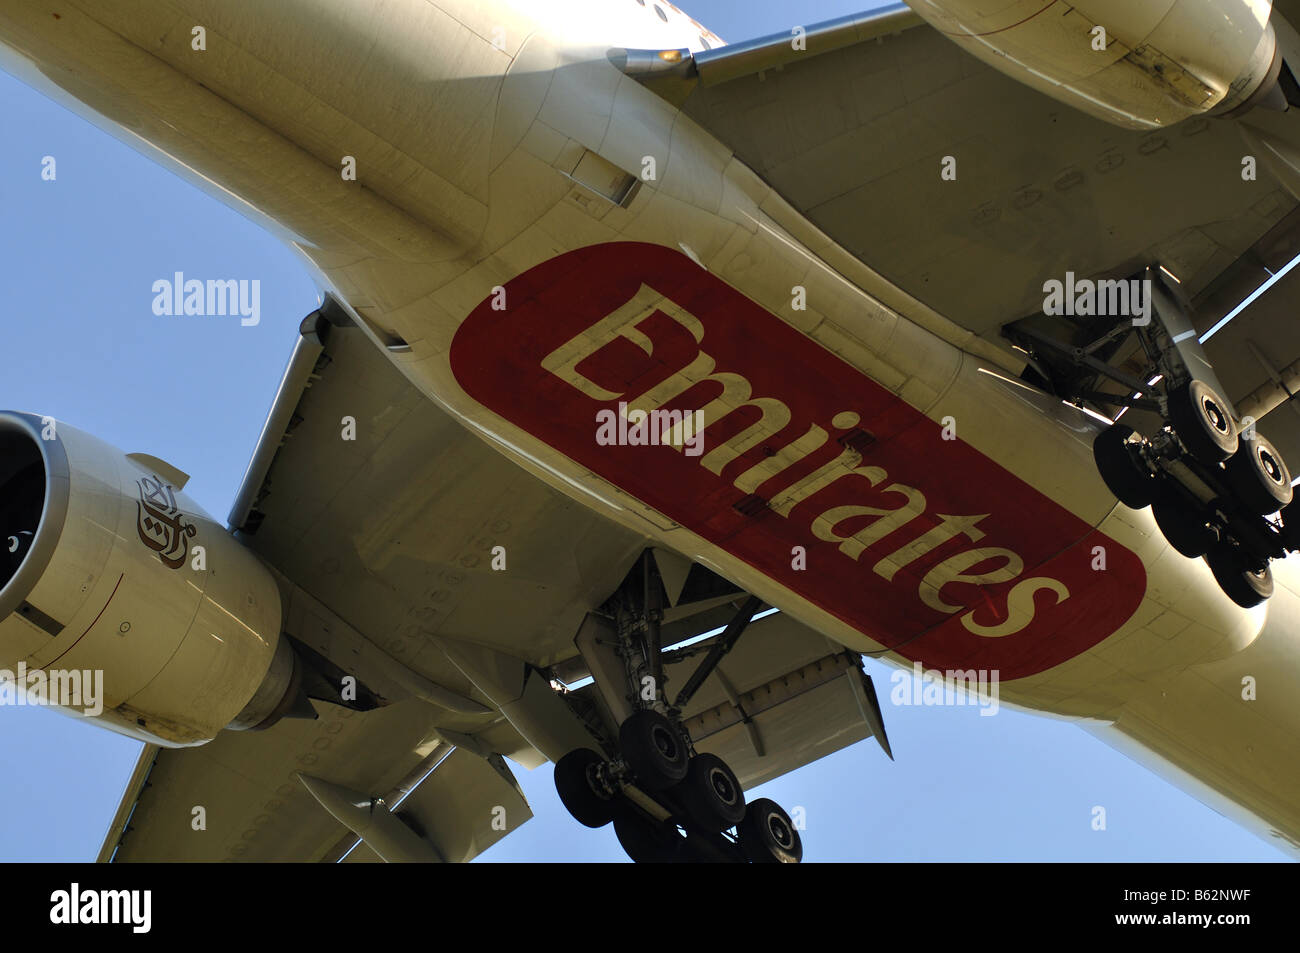 Emirates Airlines Boeing 777 aircraft landing at Birmingham International Airport England UK - Stock Image